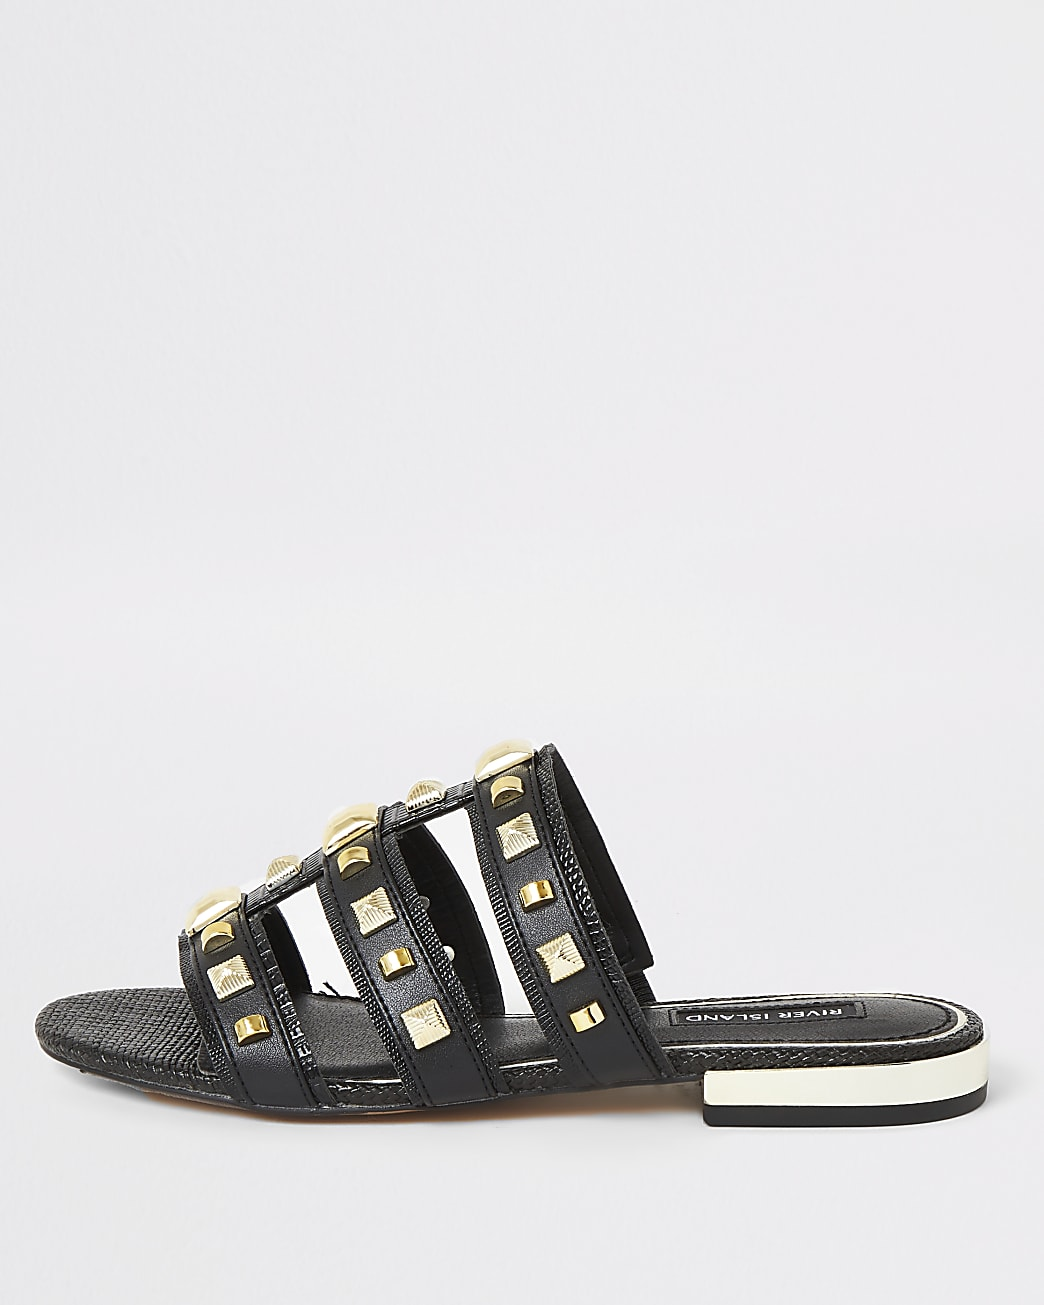 Black studded caged Mule sandals